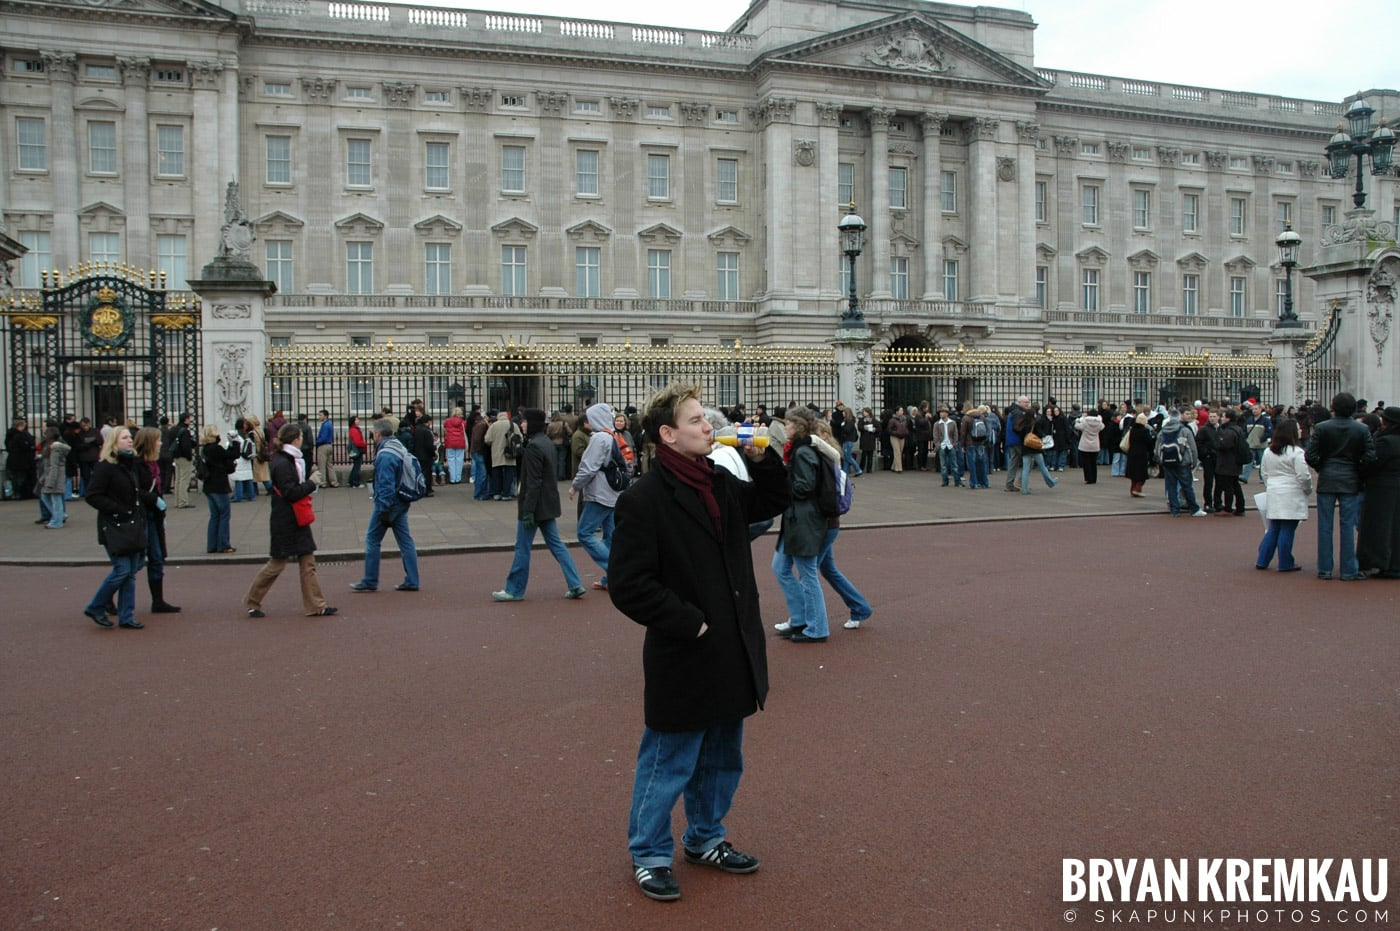 London, England - Day 5 - 12.20.05 (13)